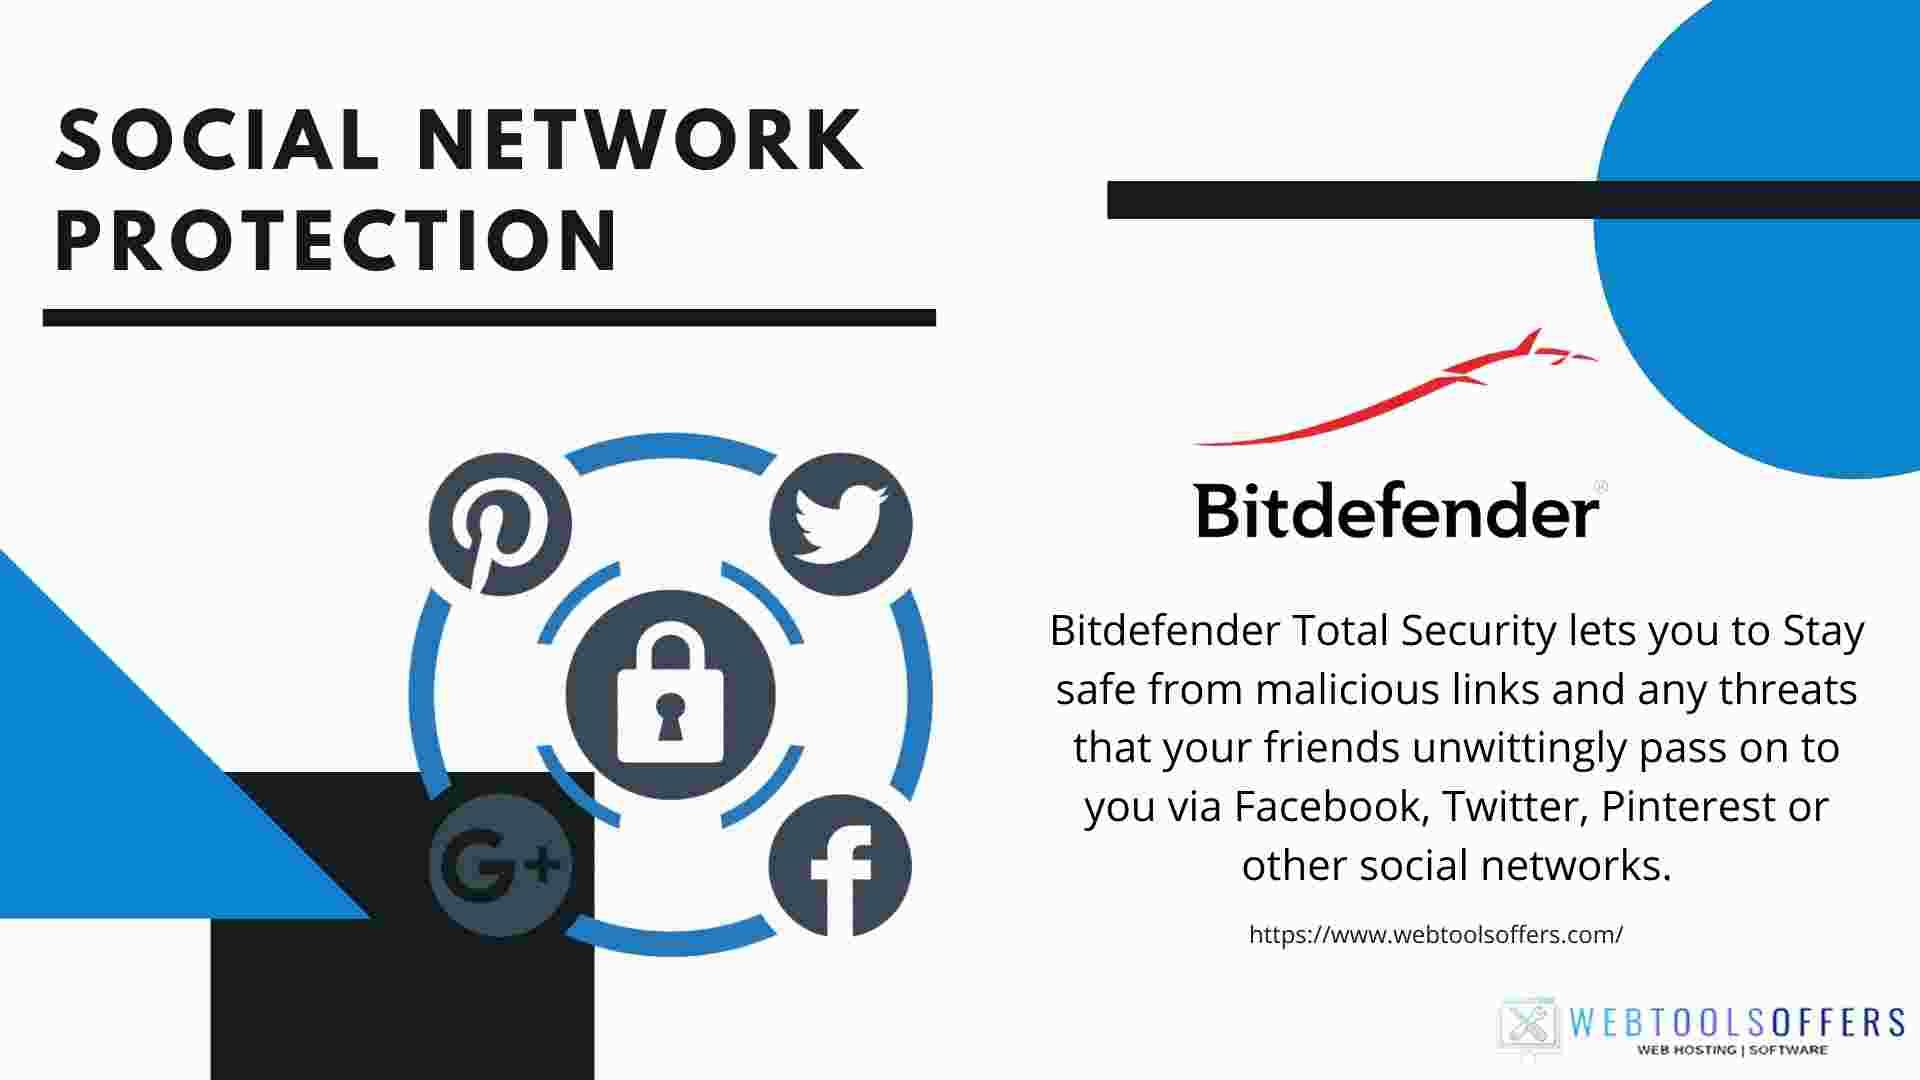 Bitdefender total Security Social network protection